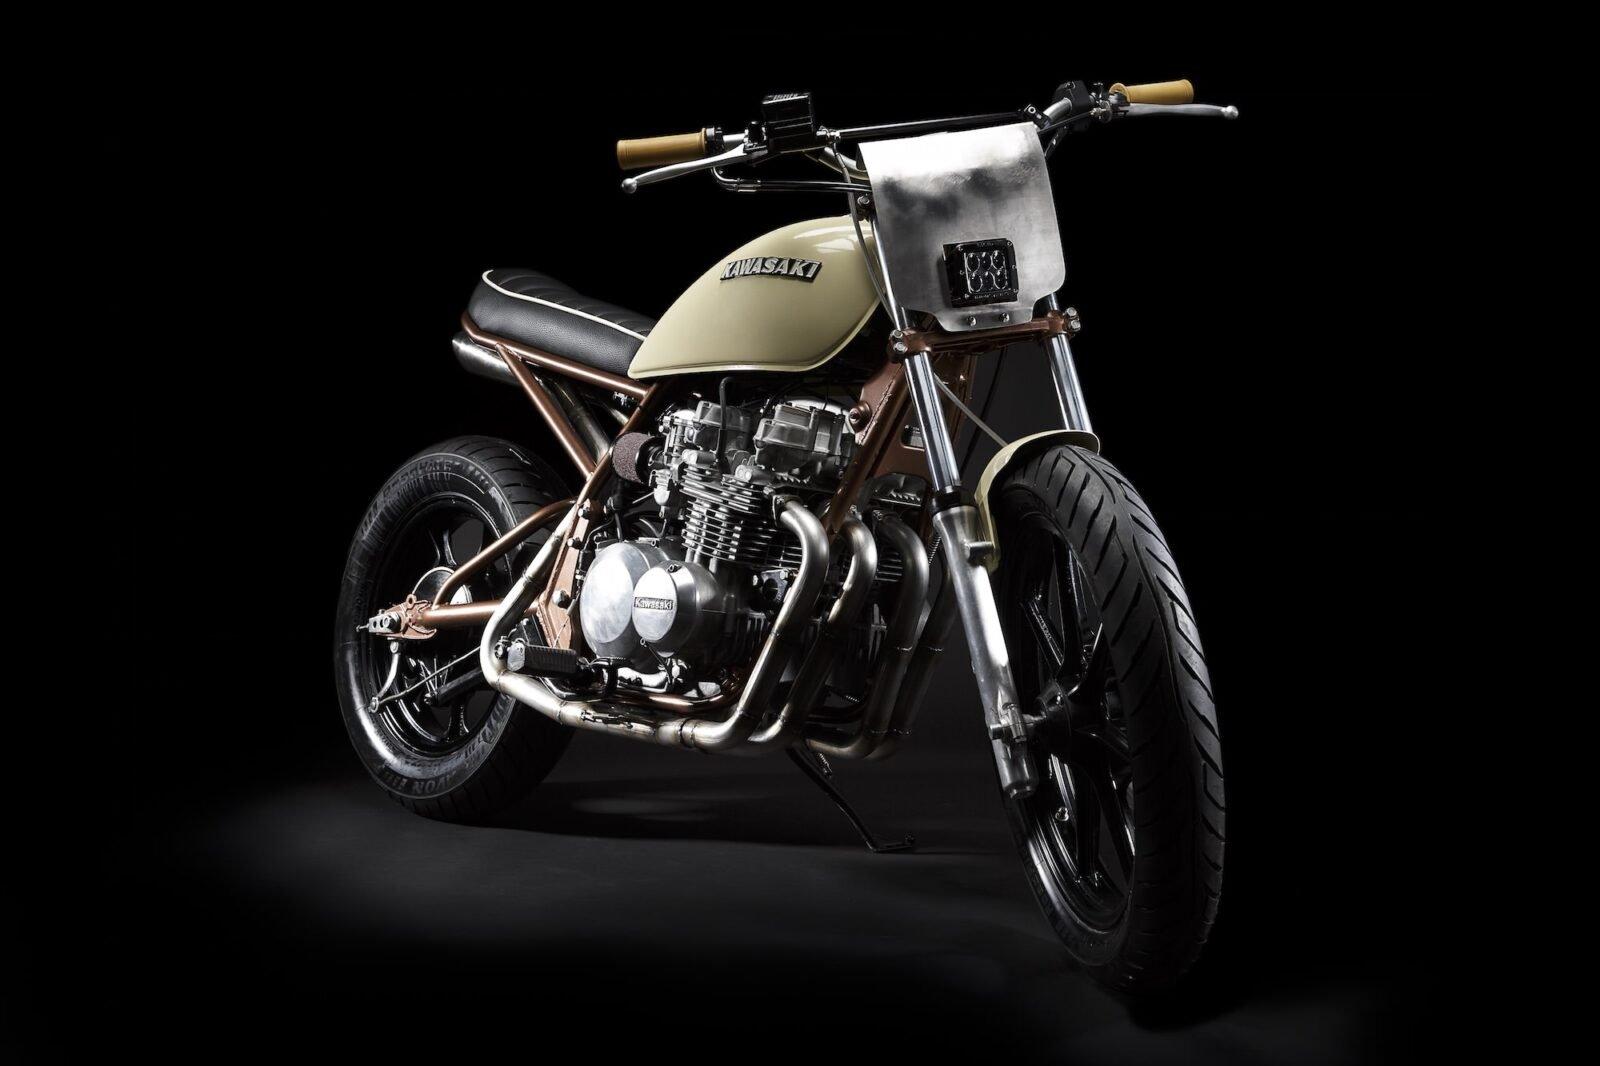 Kawasaki KZ550 8 1600x1066 - Kawasaki KZ550 by No. 8 Wire Motorcycles